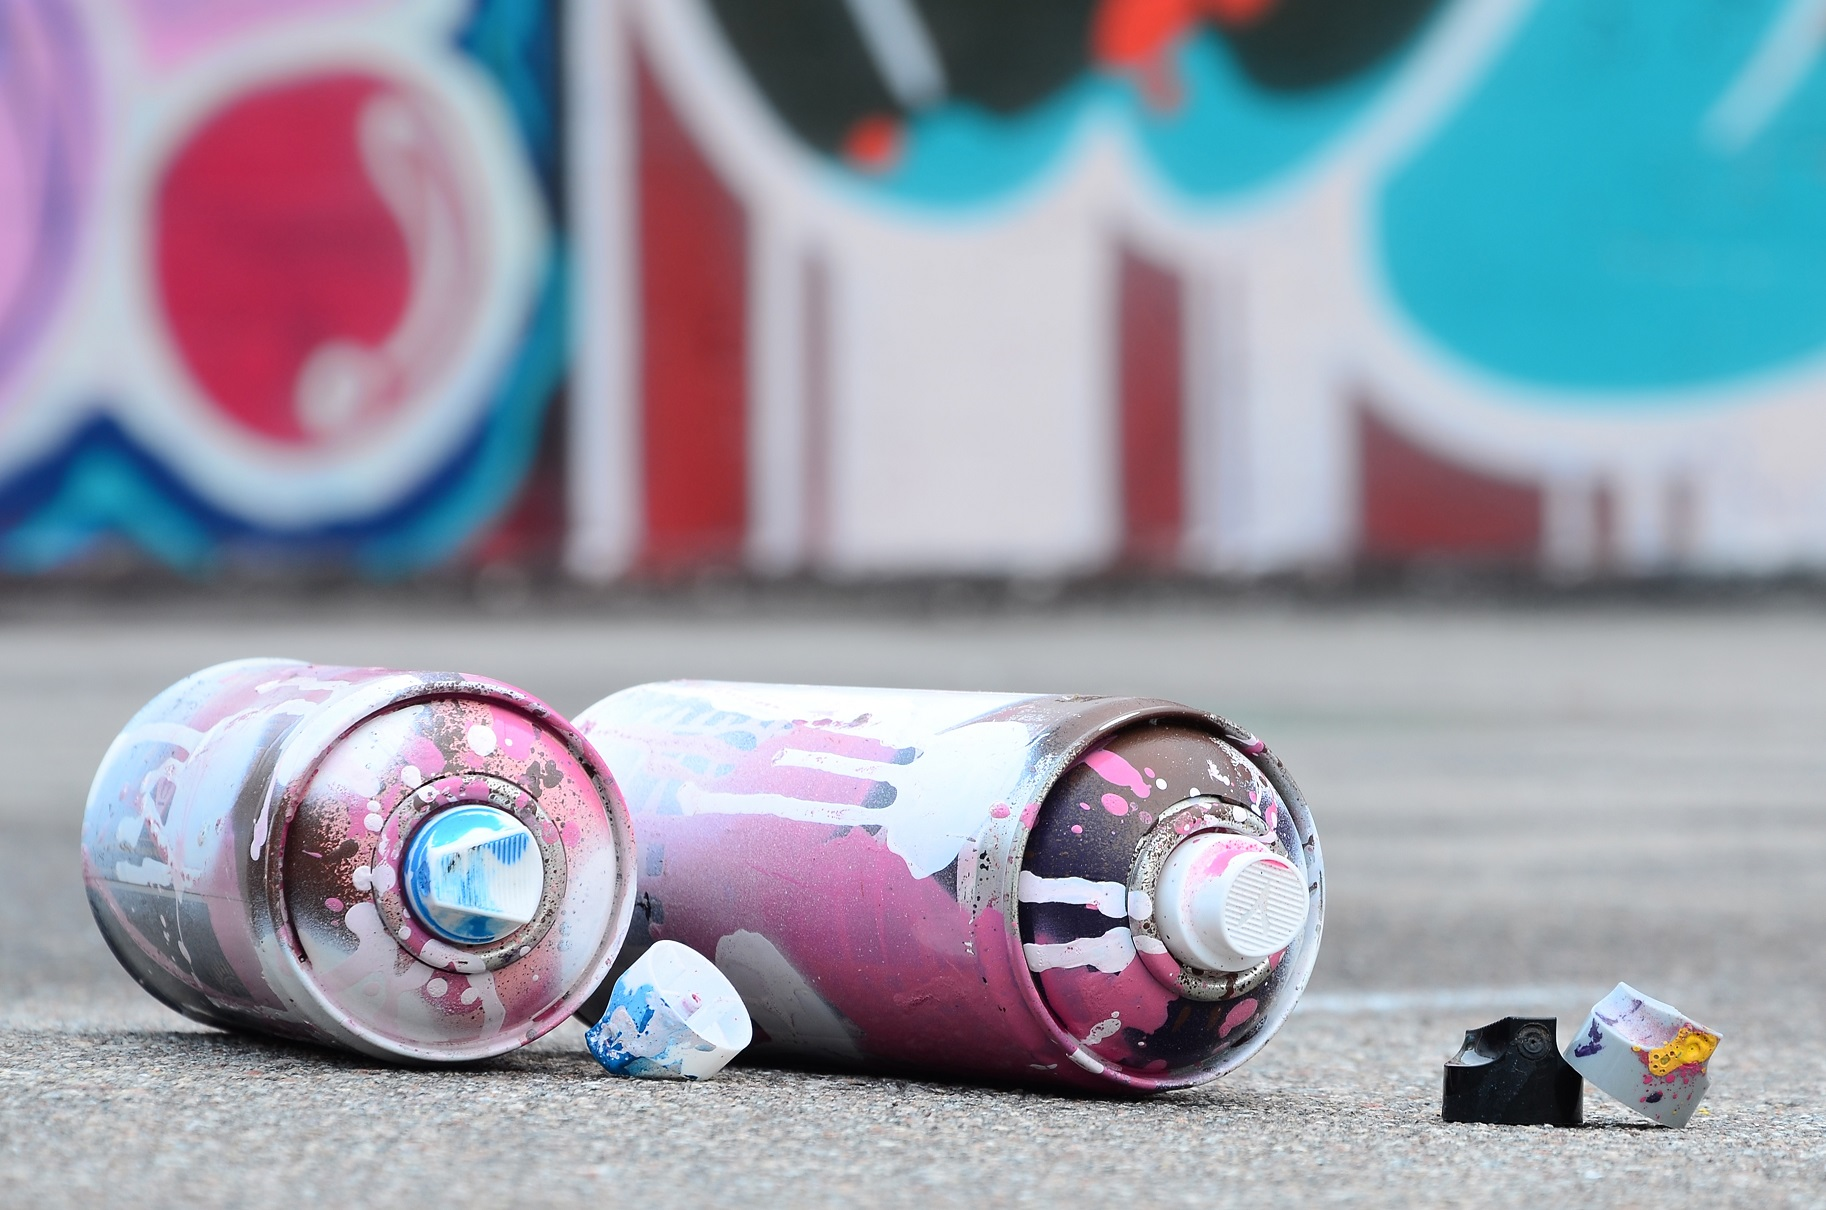 3m anti graffiti film san francisco